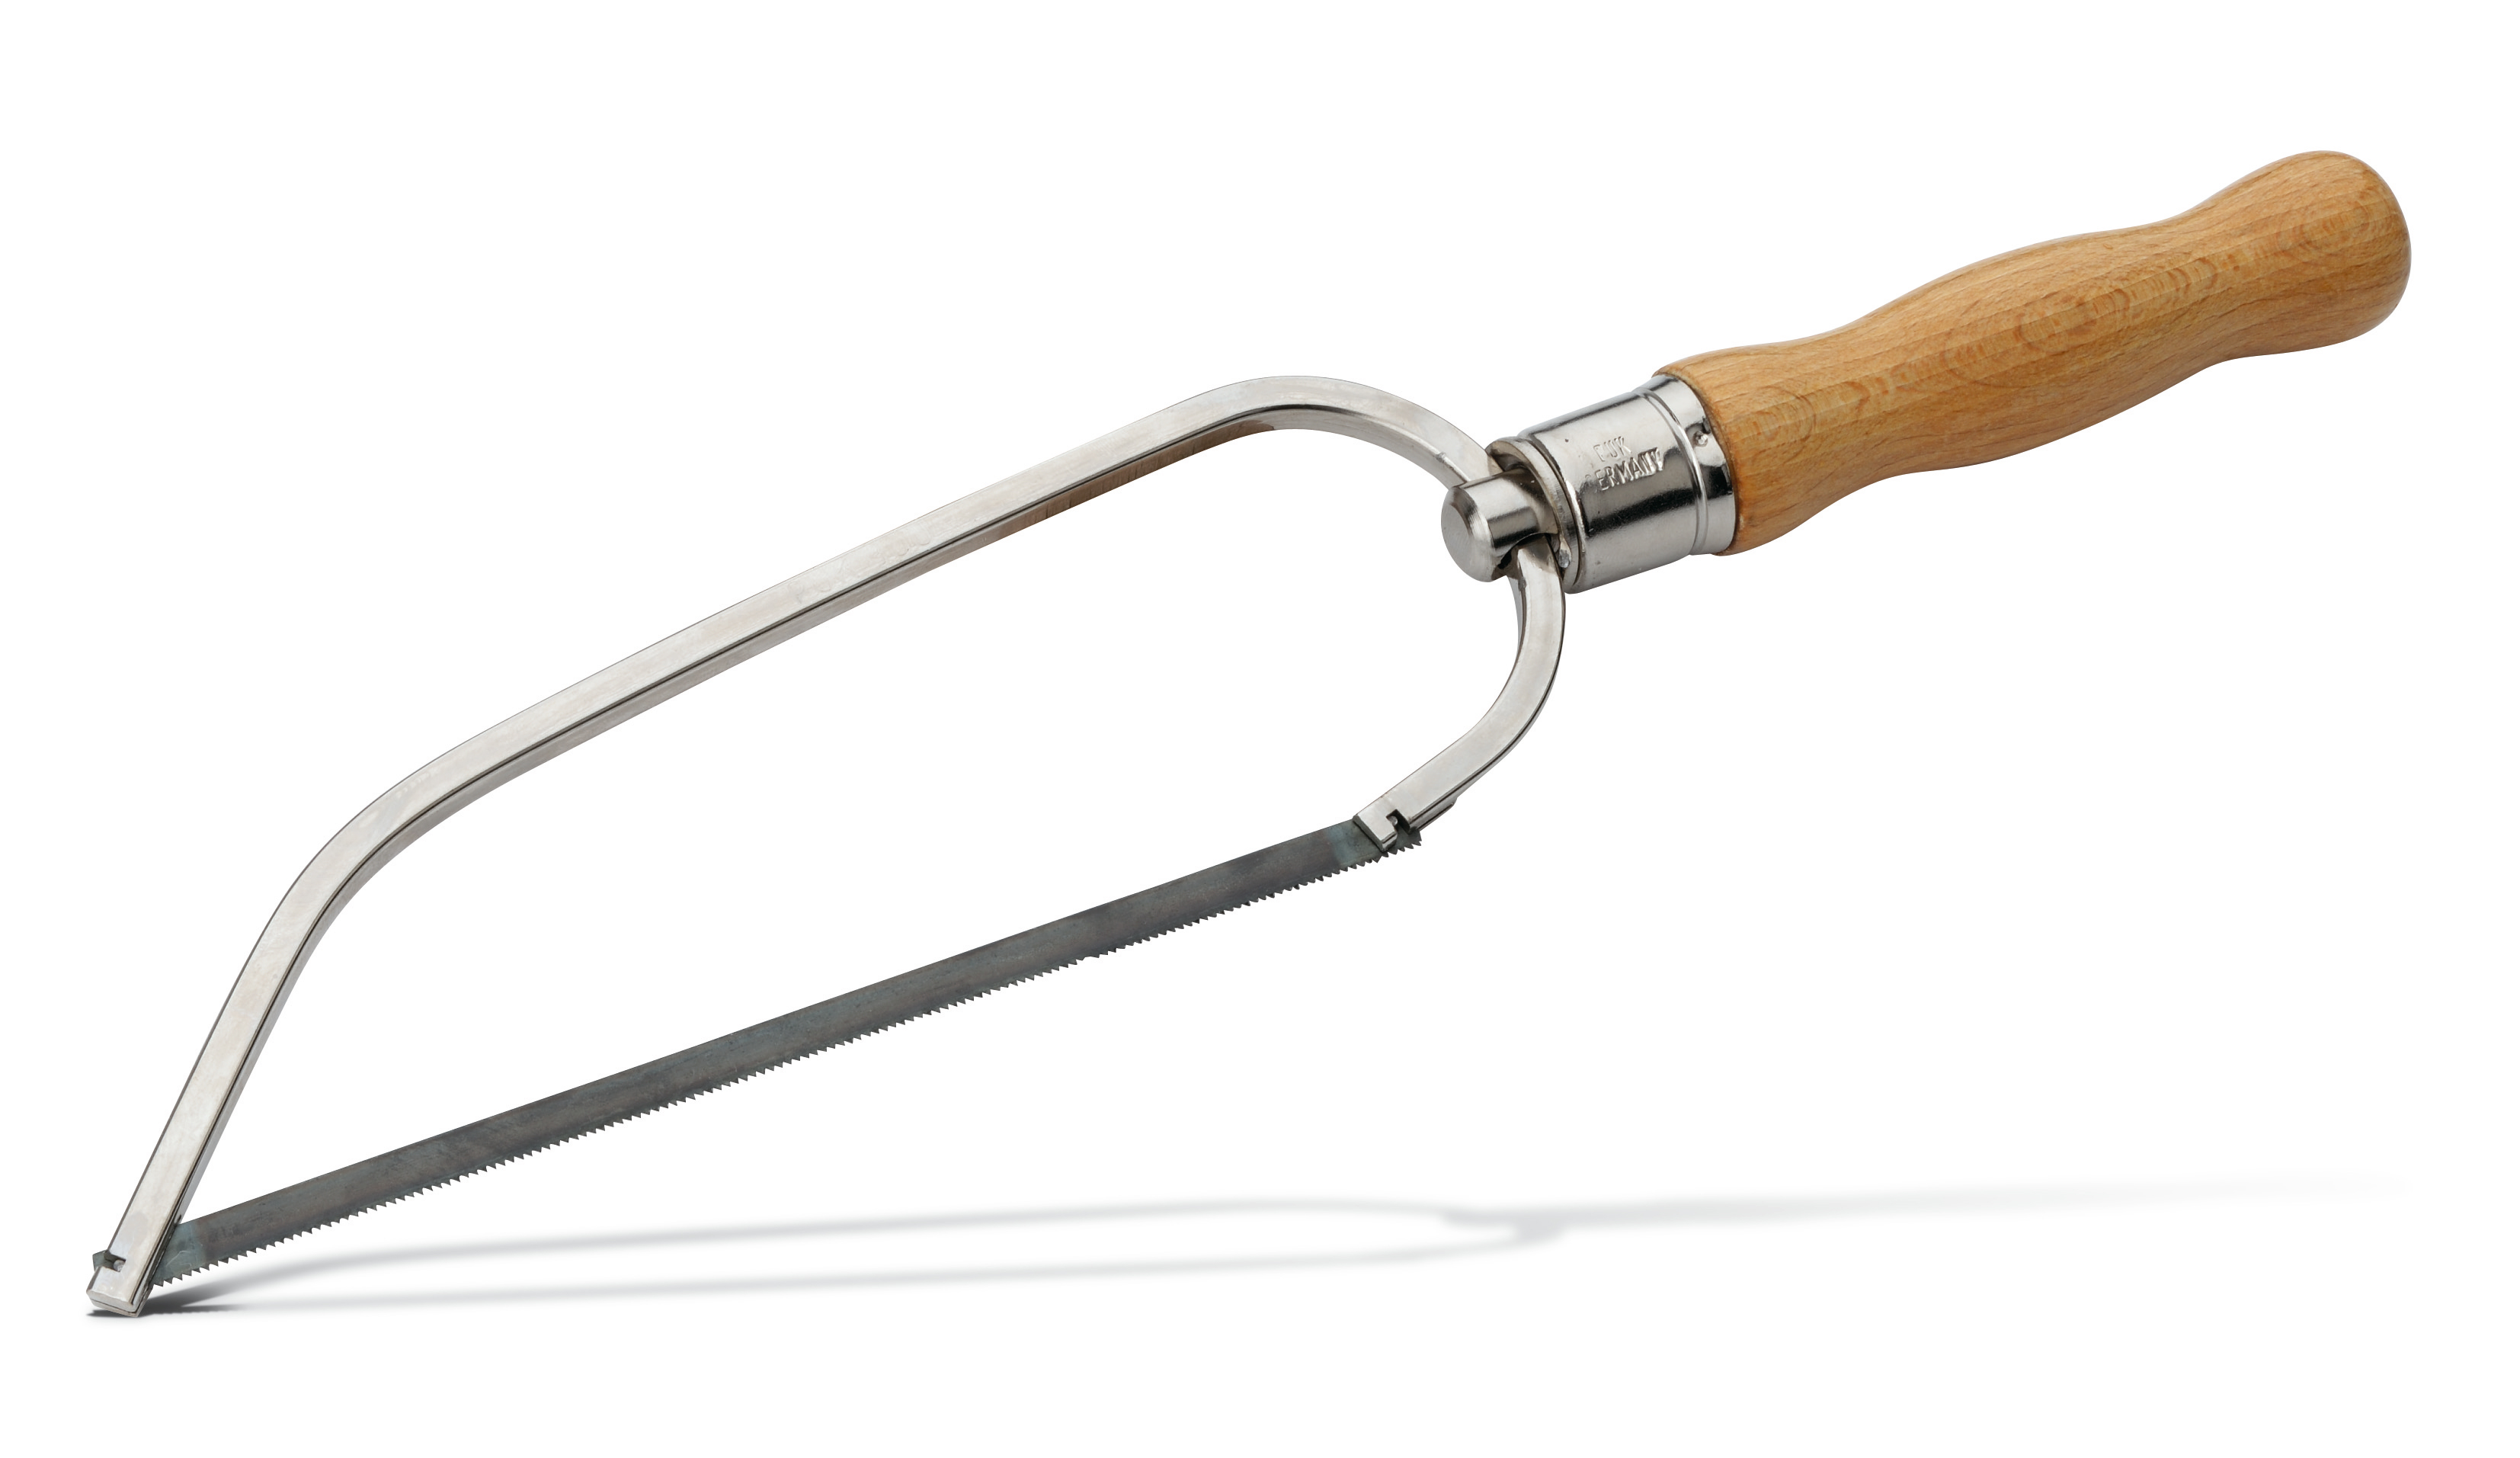 Adjustable hacksaw Spare blades for wood (no illustration) Pajarito